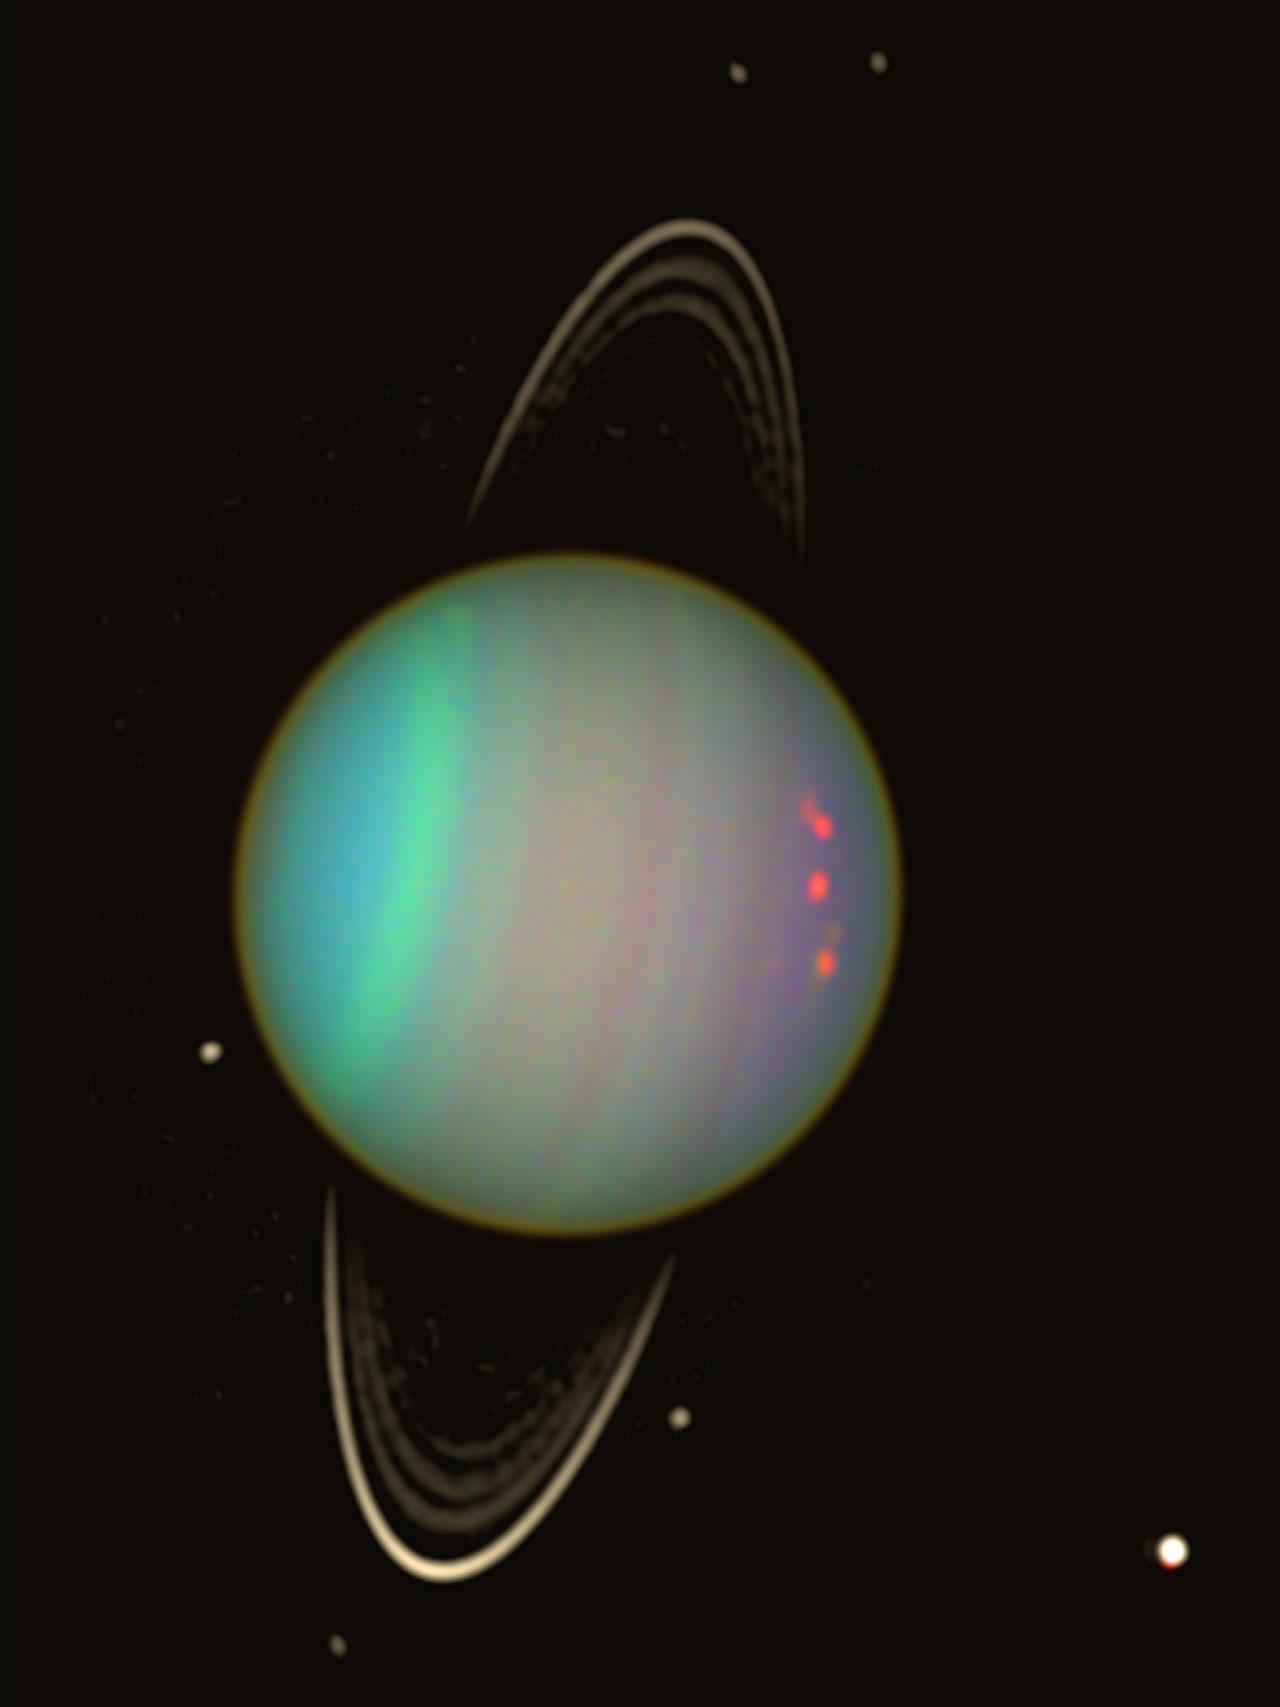 Uranus - Wider View